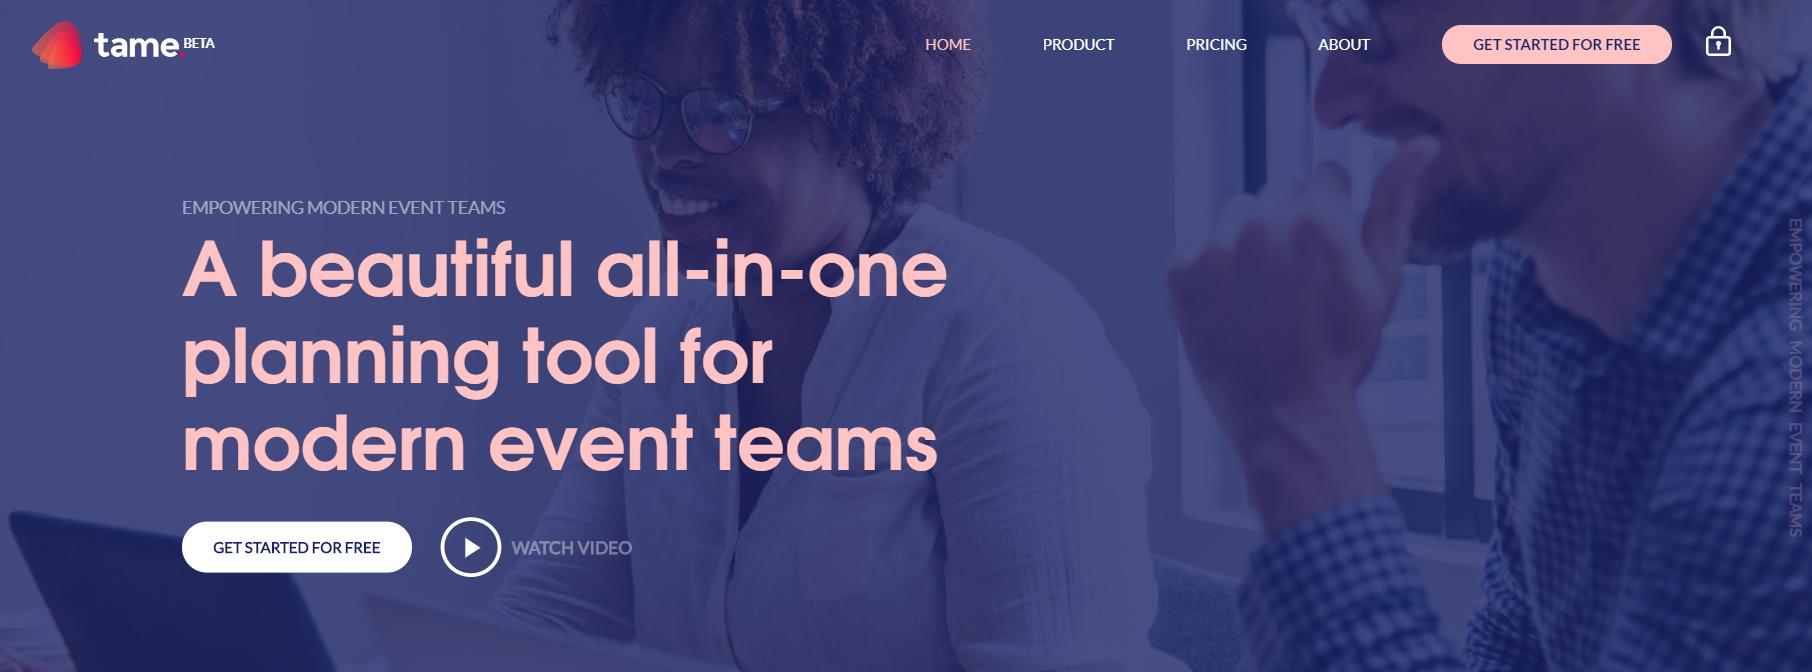 Tame Homepage